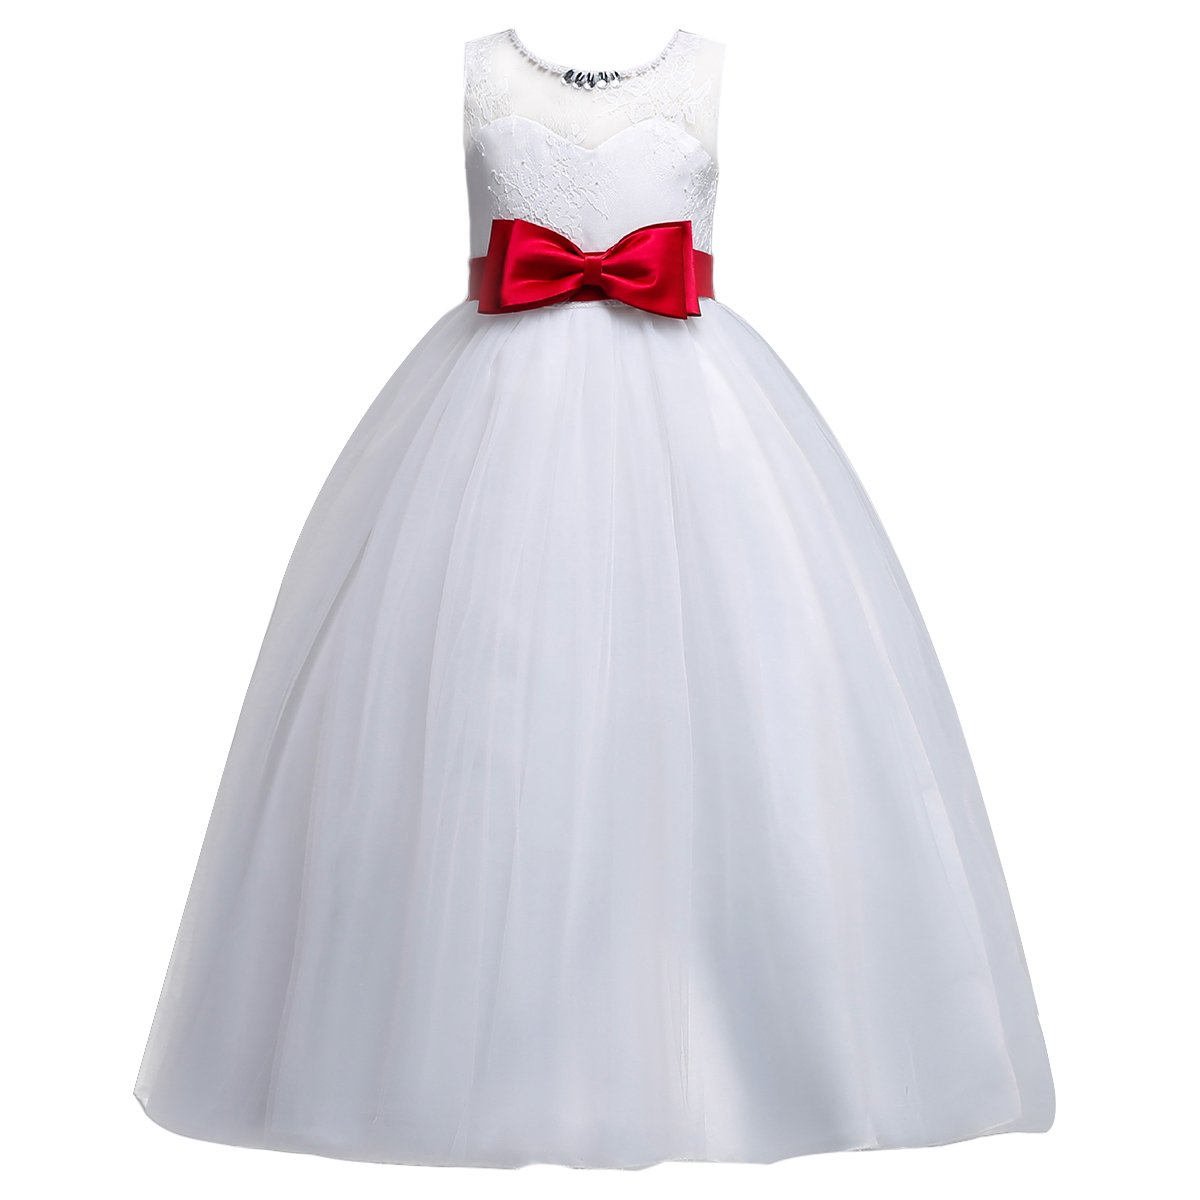 IBTOM CASTLE Little Big Girl Tulle Lace Pageant Flower Wedding Dress Floor Length Long Party Formal Dance Gown